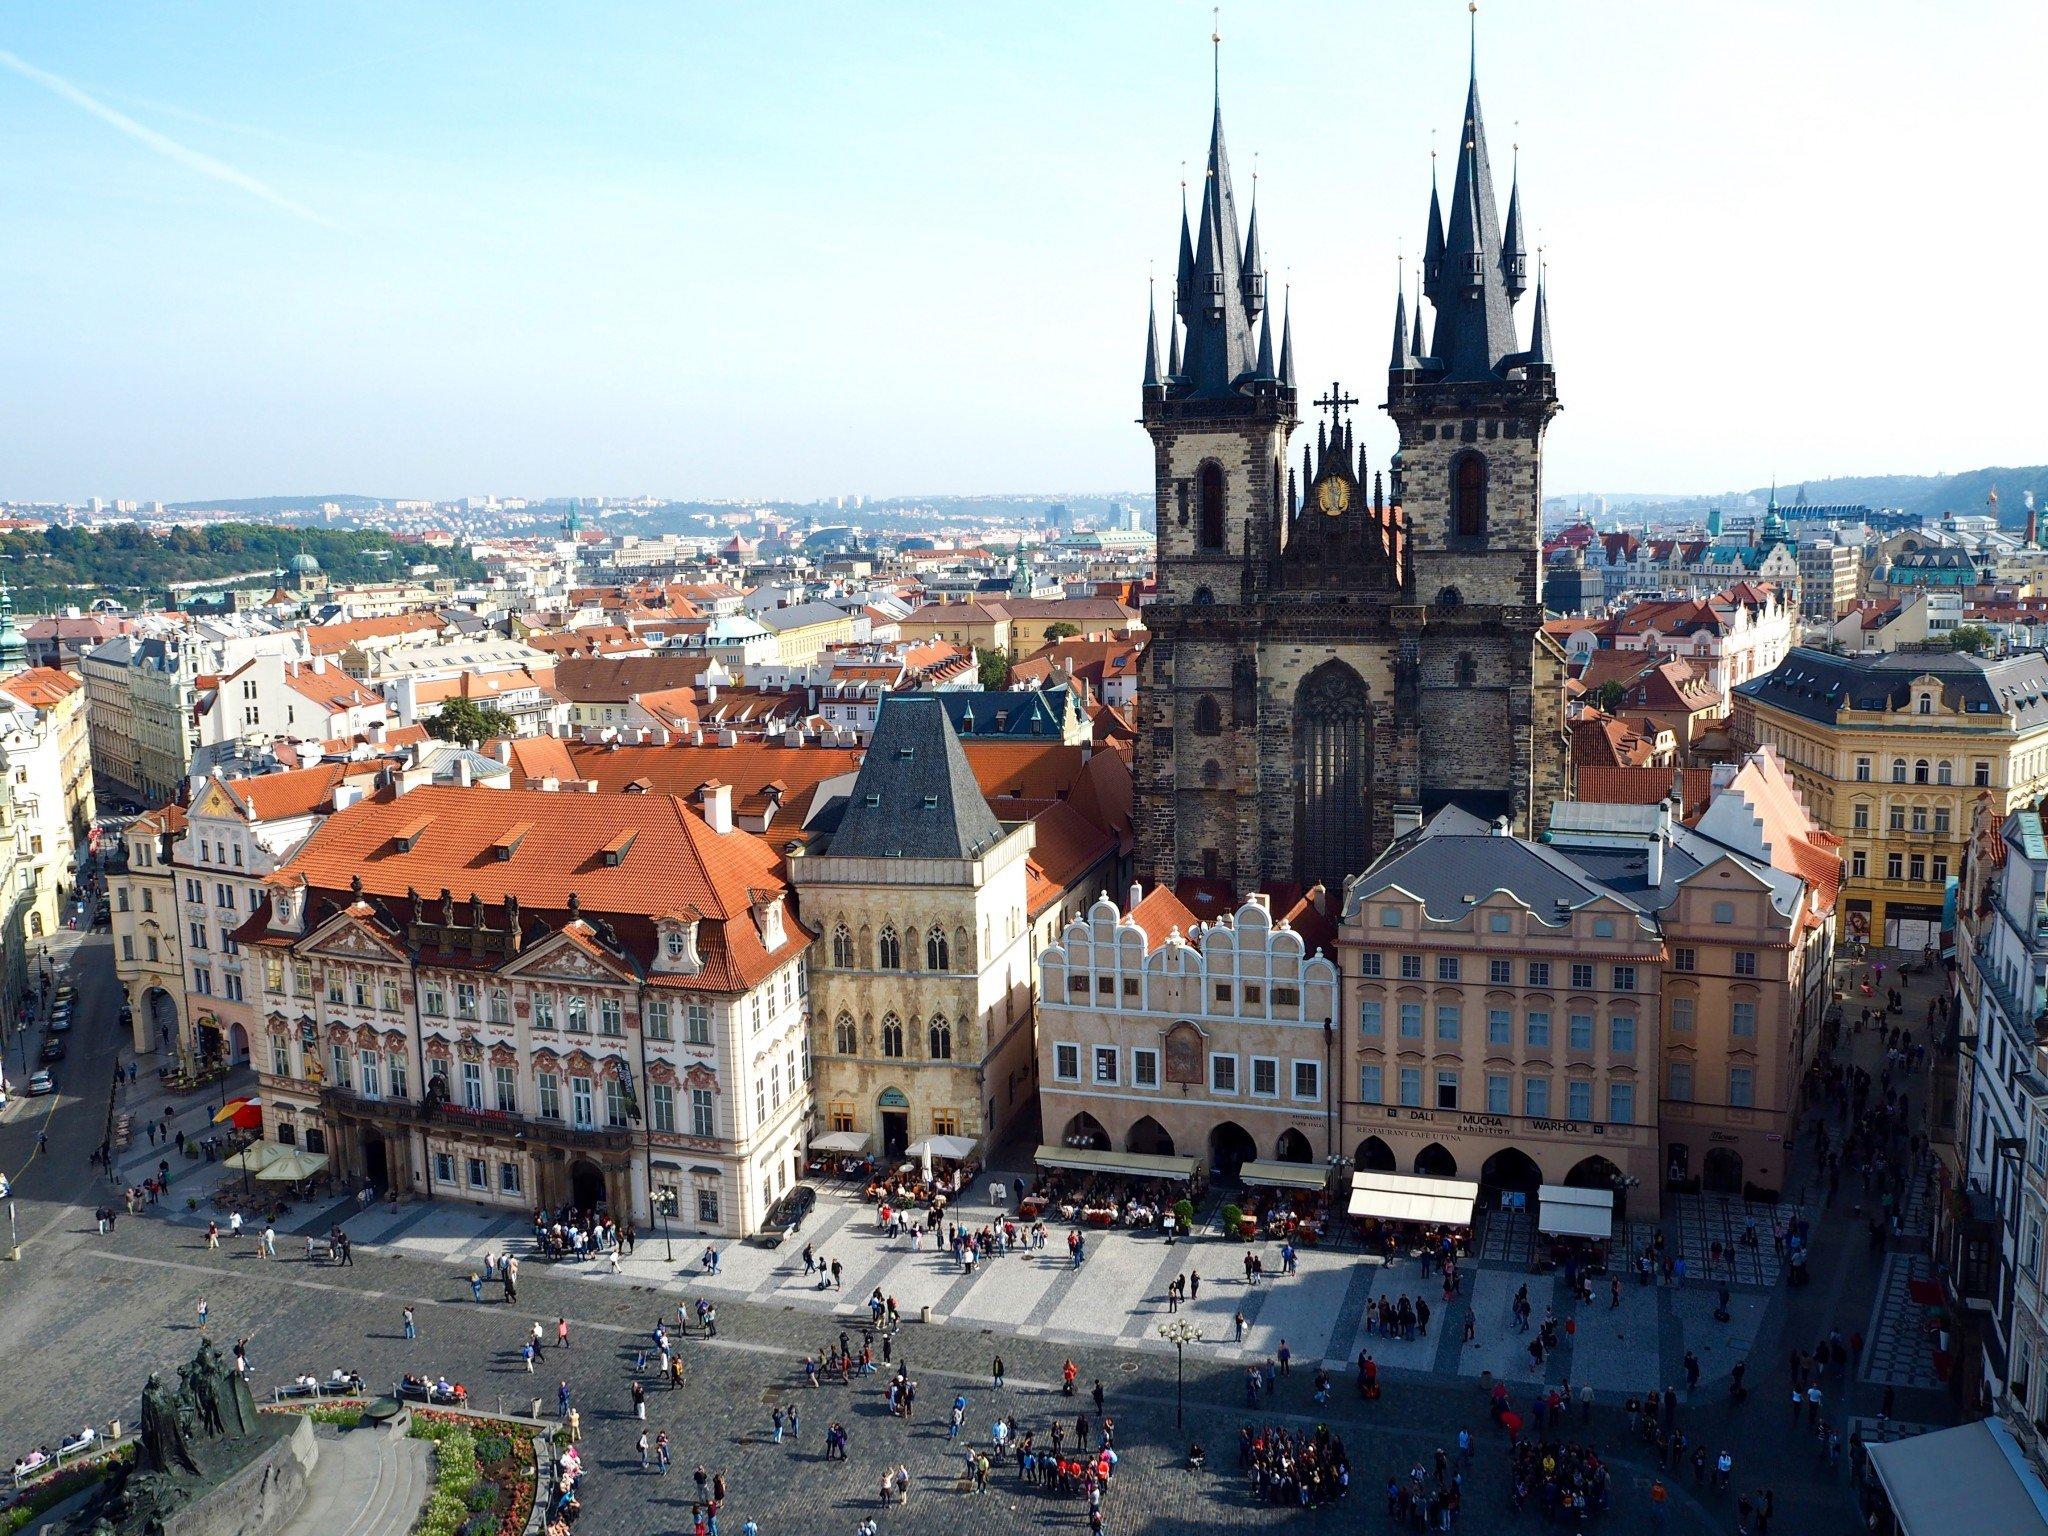 Prahan vanha kaupunki: raatihuoneen torni